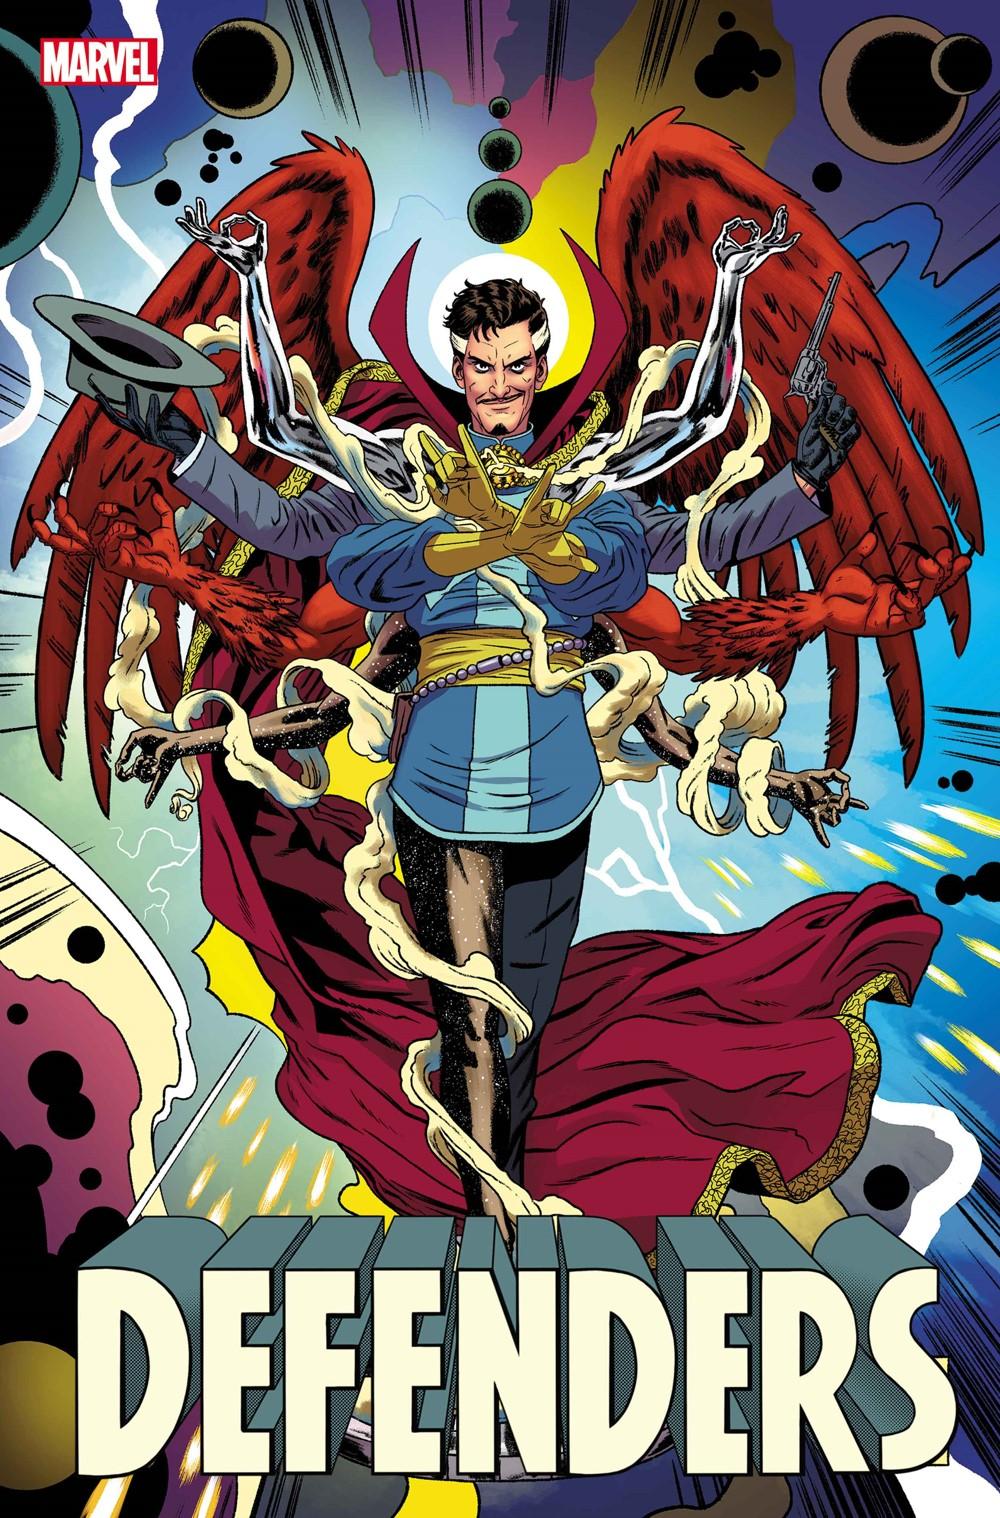 DEFENDERS2021002_Quinones-var Marvel Comics September 2021 Solicitations